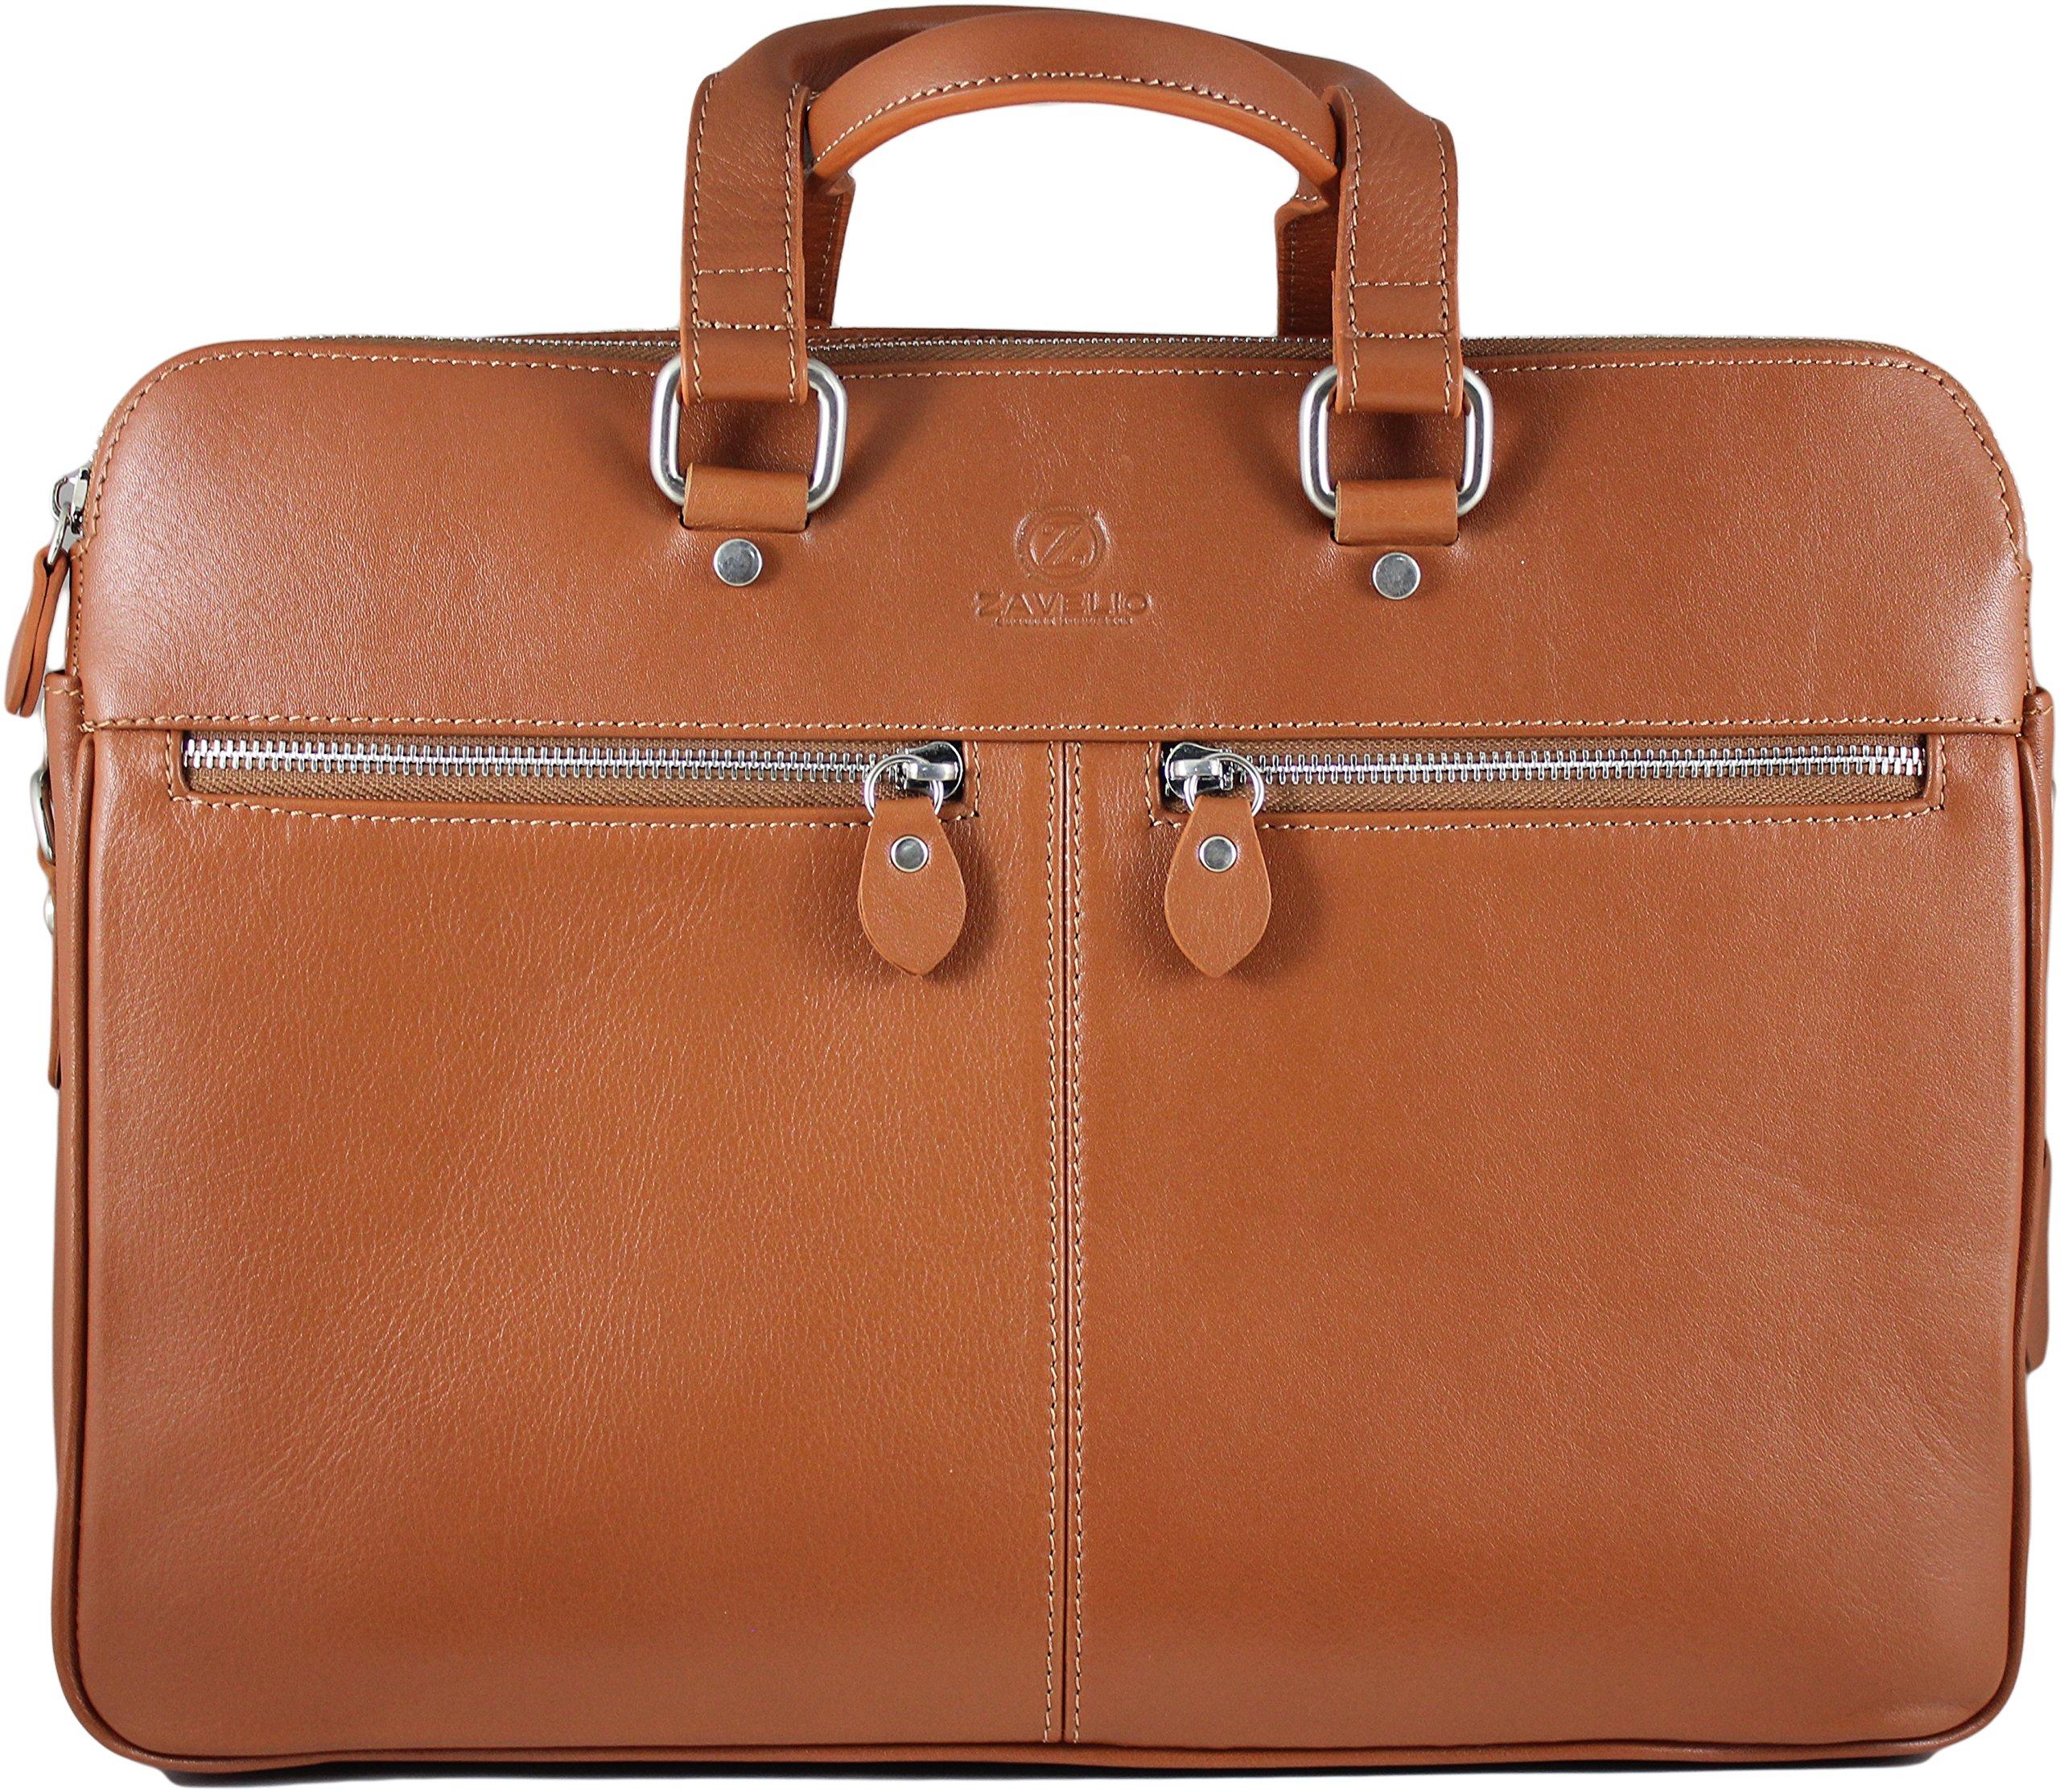 Zavelio Men's David Genuine Leather Business Briefcase Messenger Shoulder Bag Tan